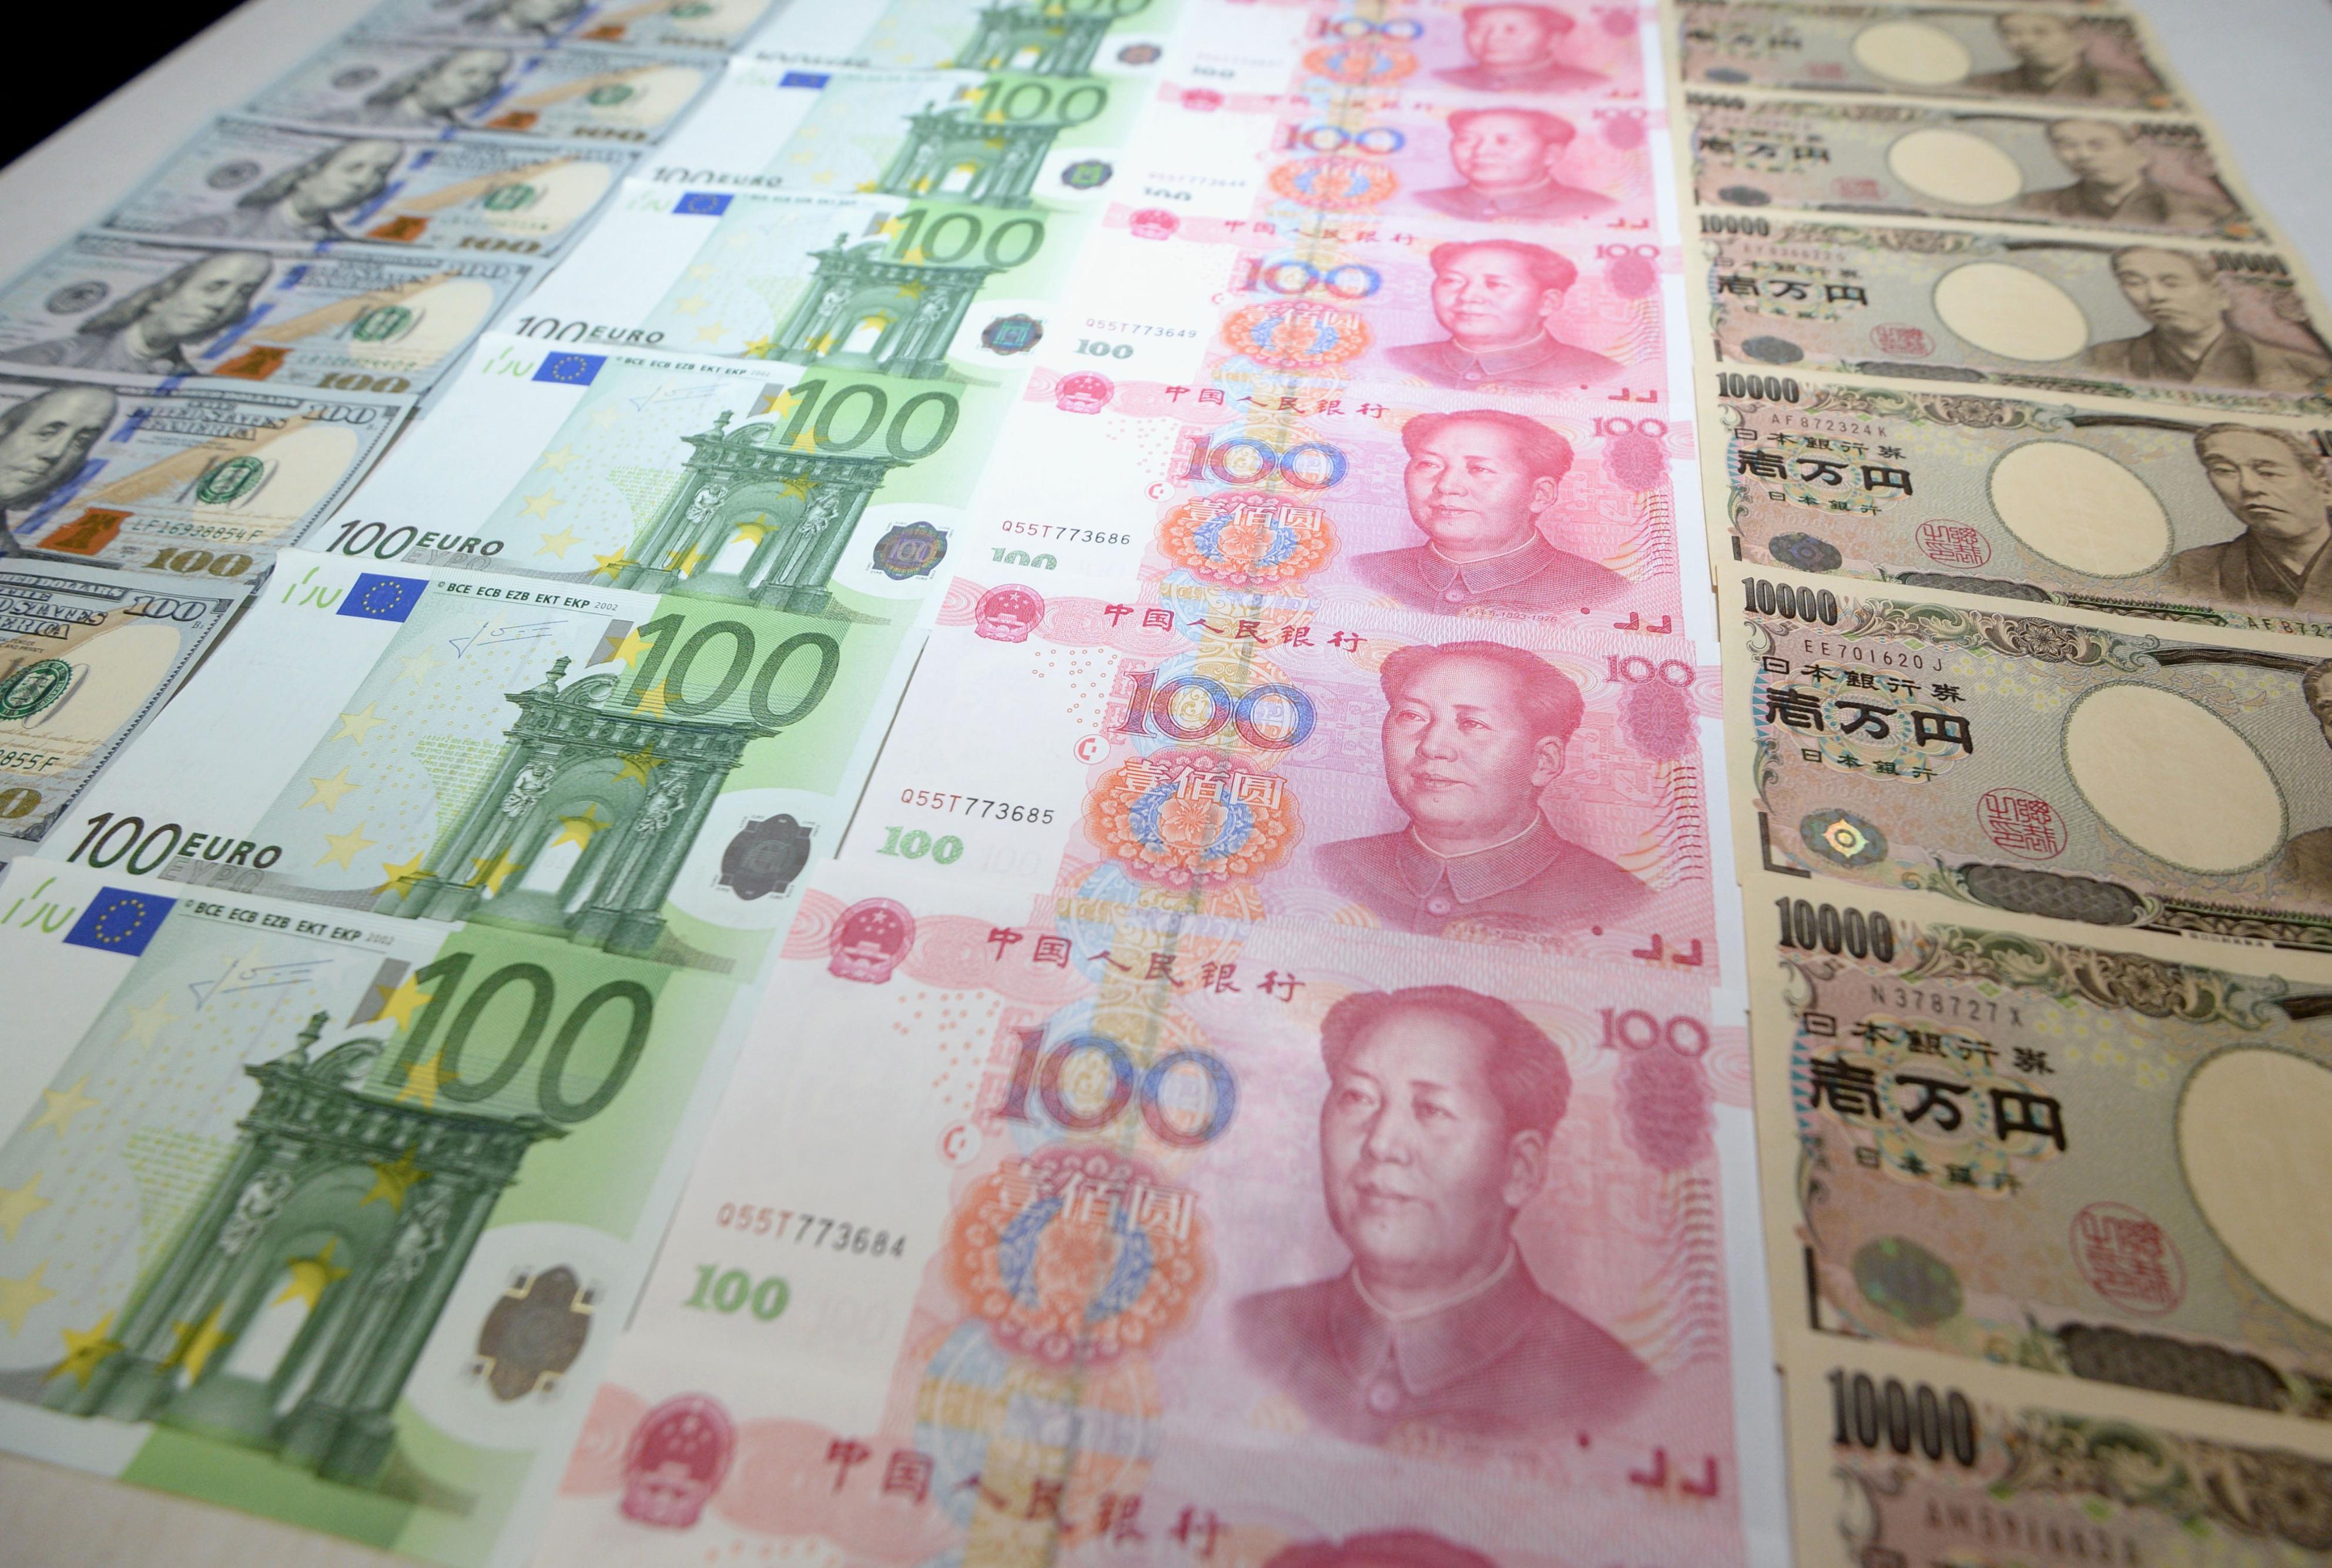 Rows of U.S. dollar, euro, Chinese yuan, and Japanese yen bills, Nov. 30, 2015.